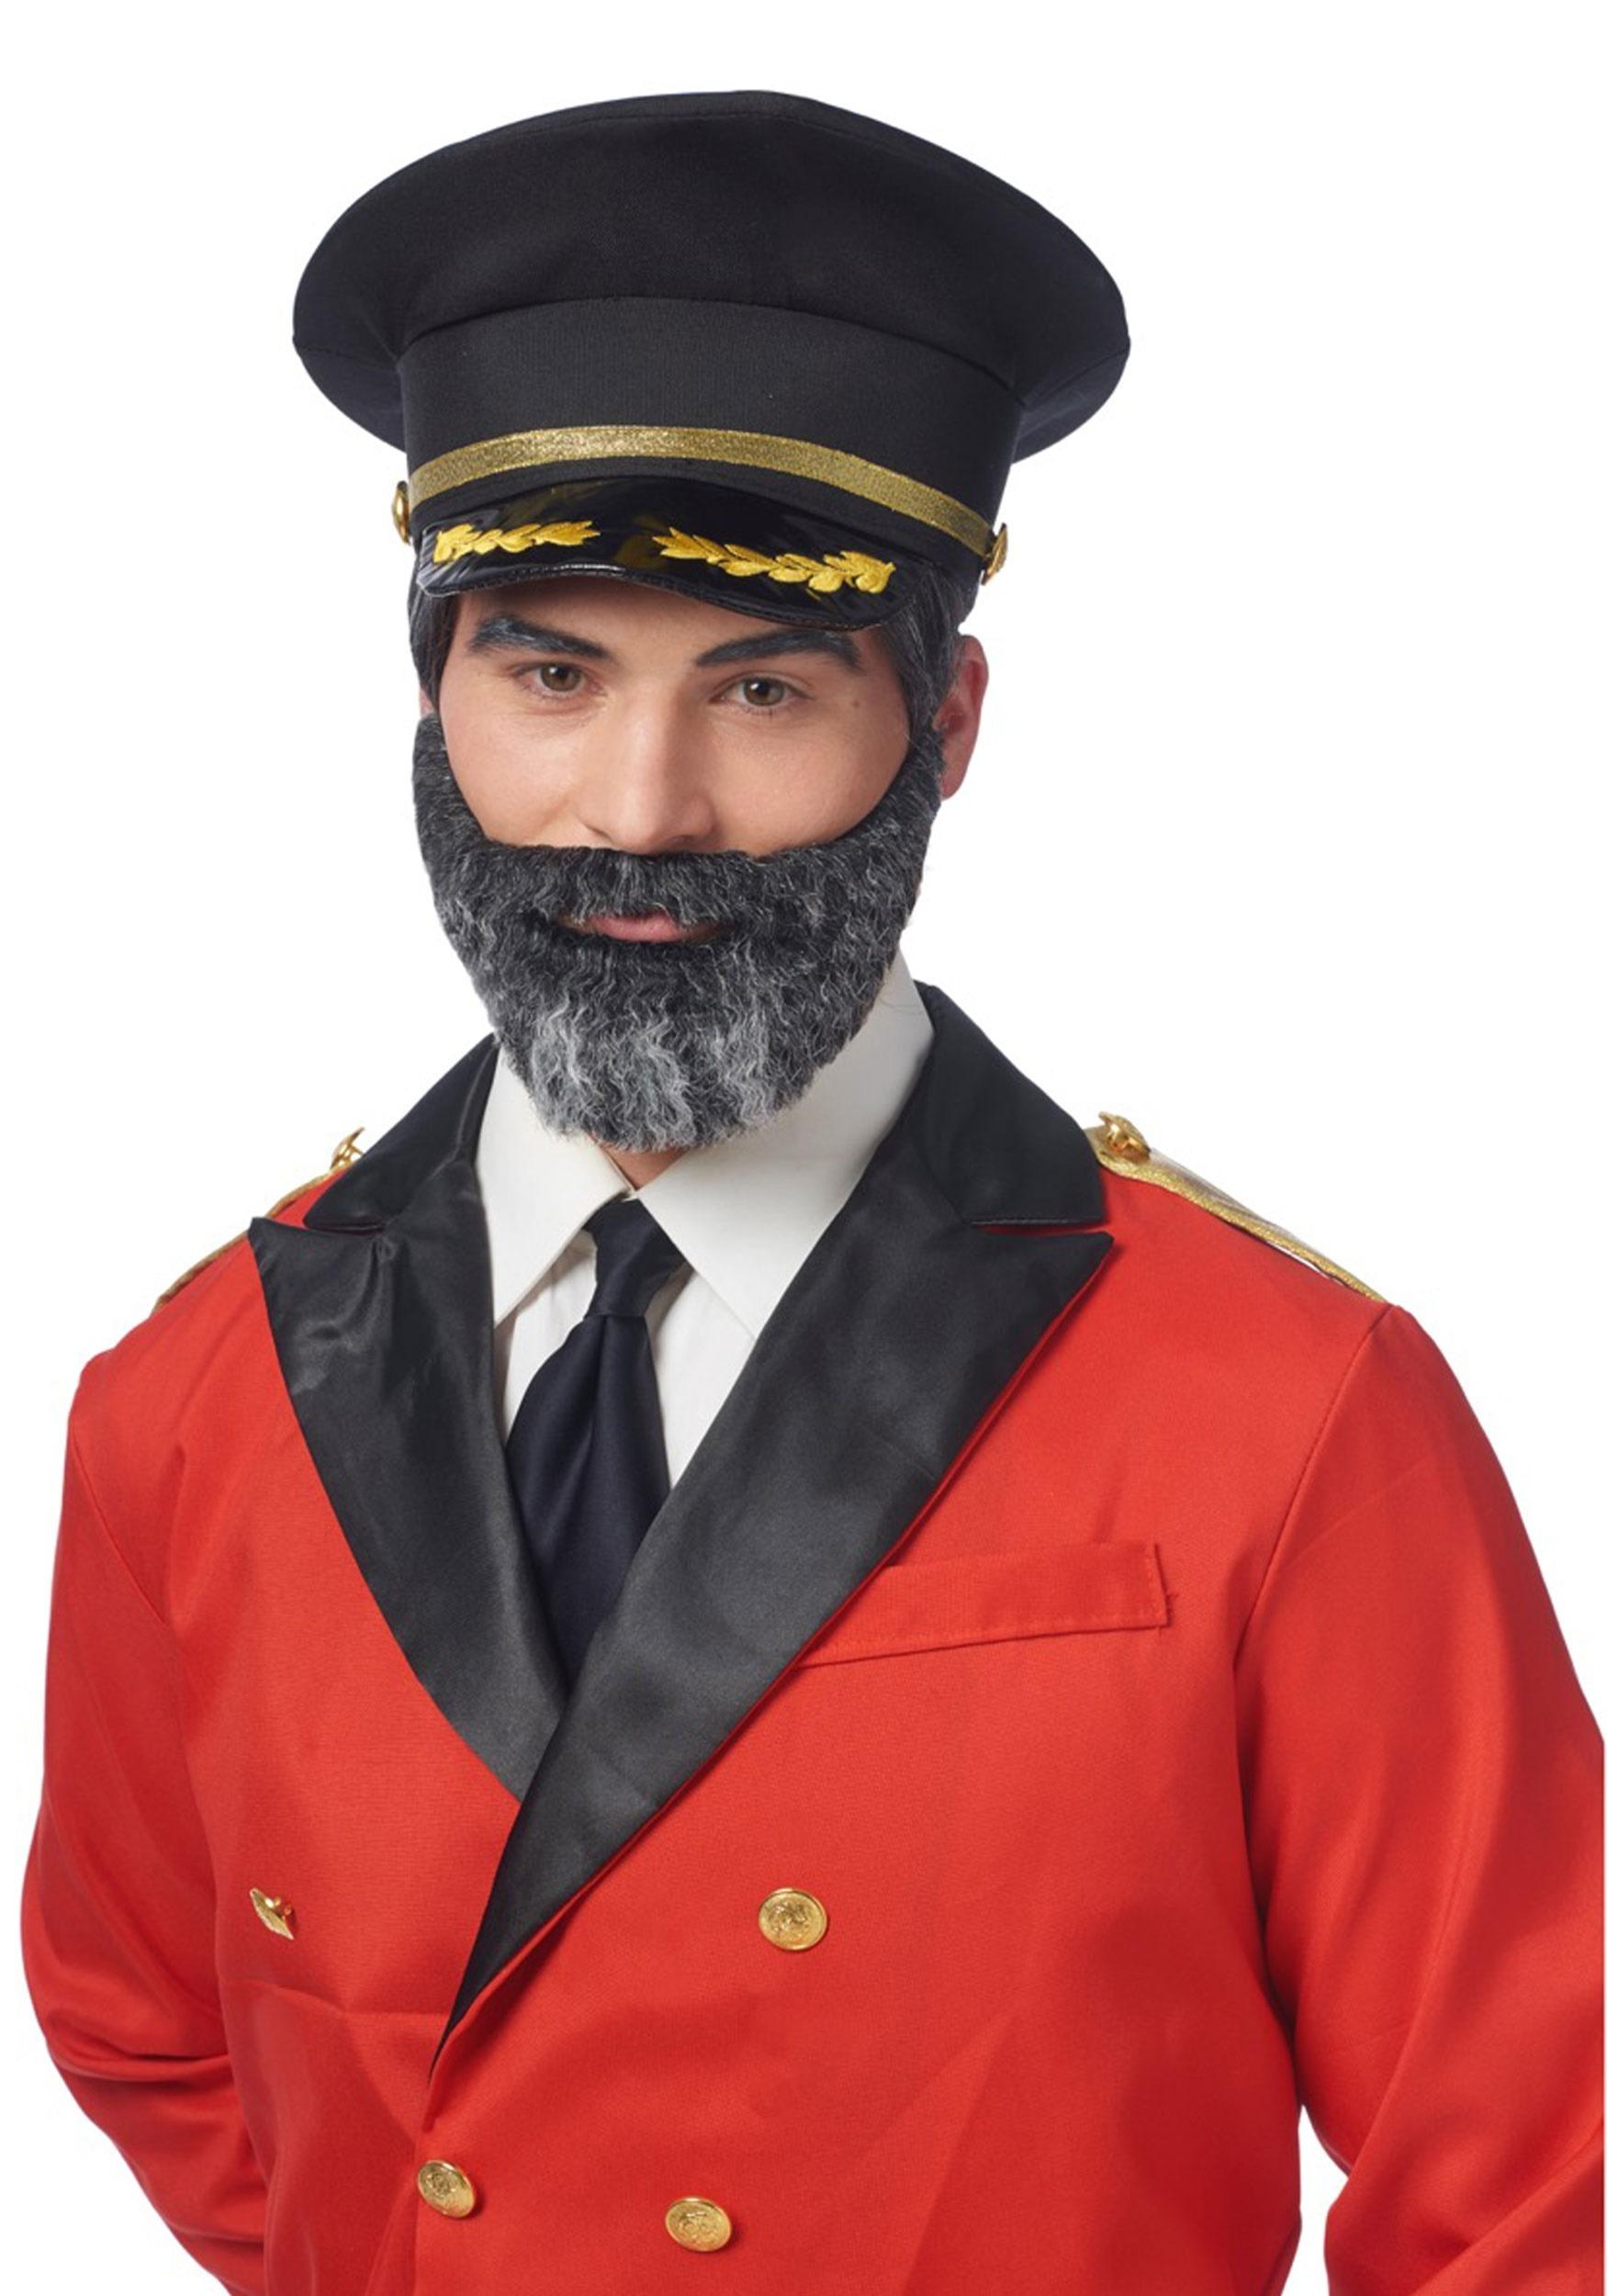 Mustache & Beard Captain Obvious